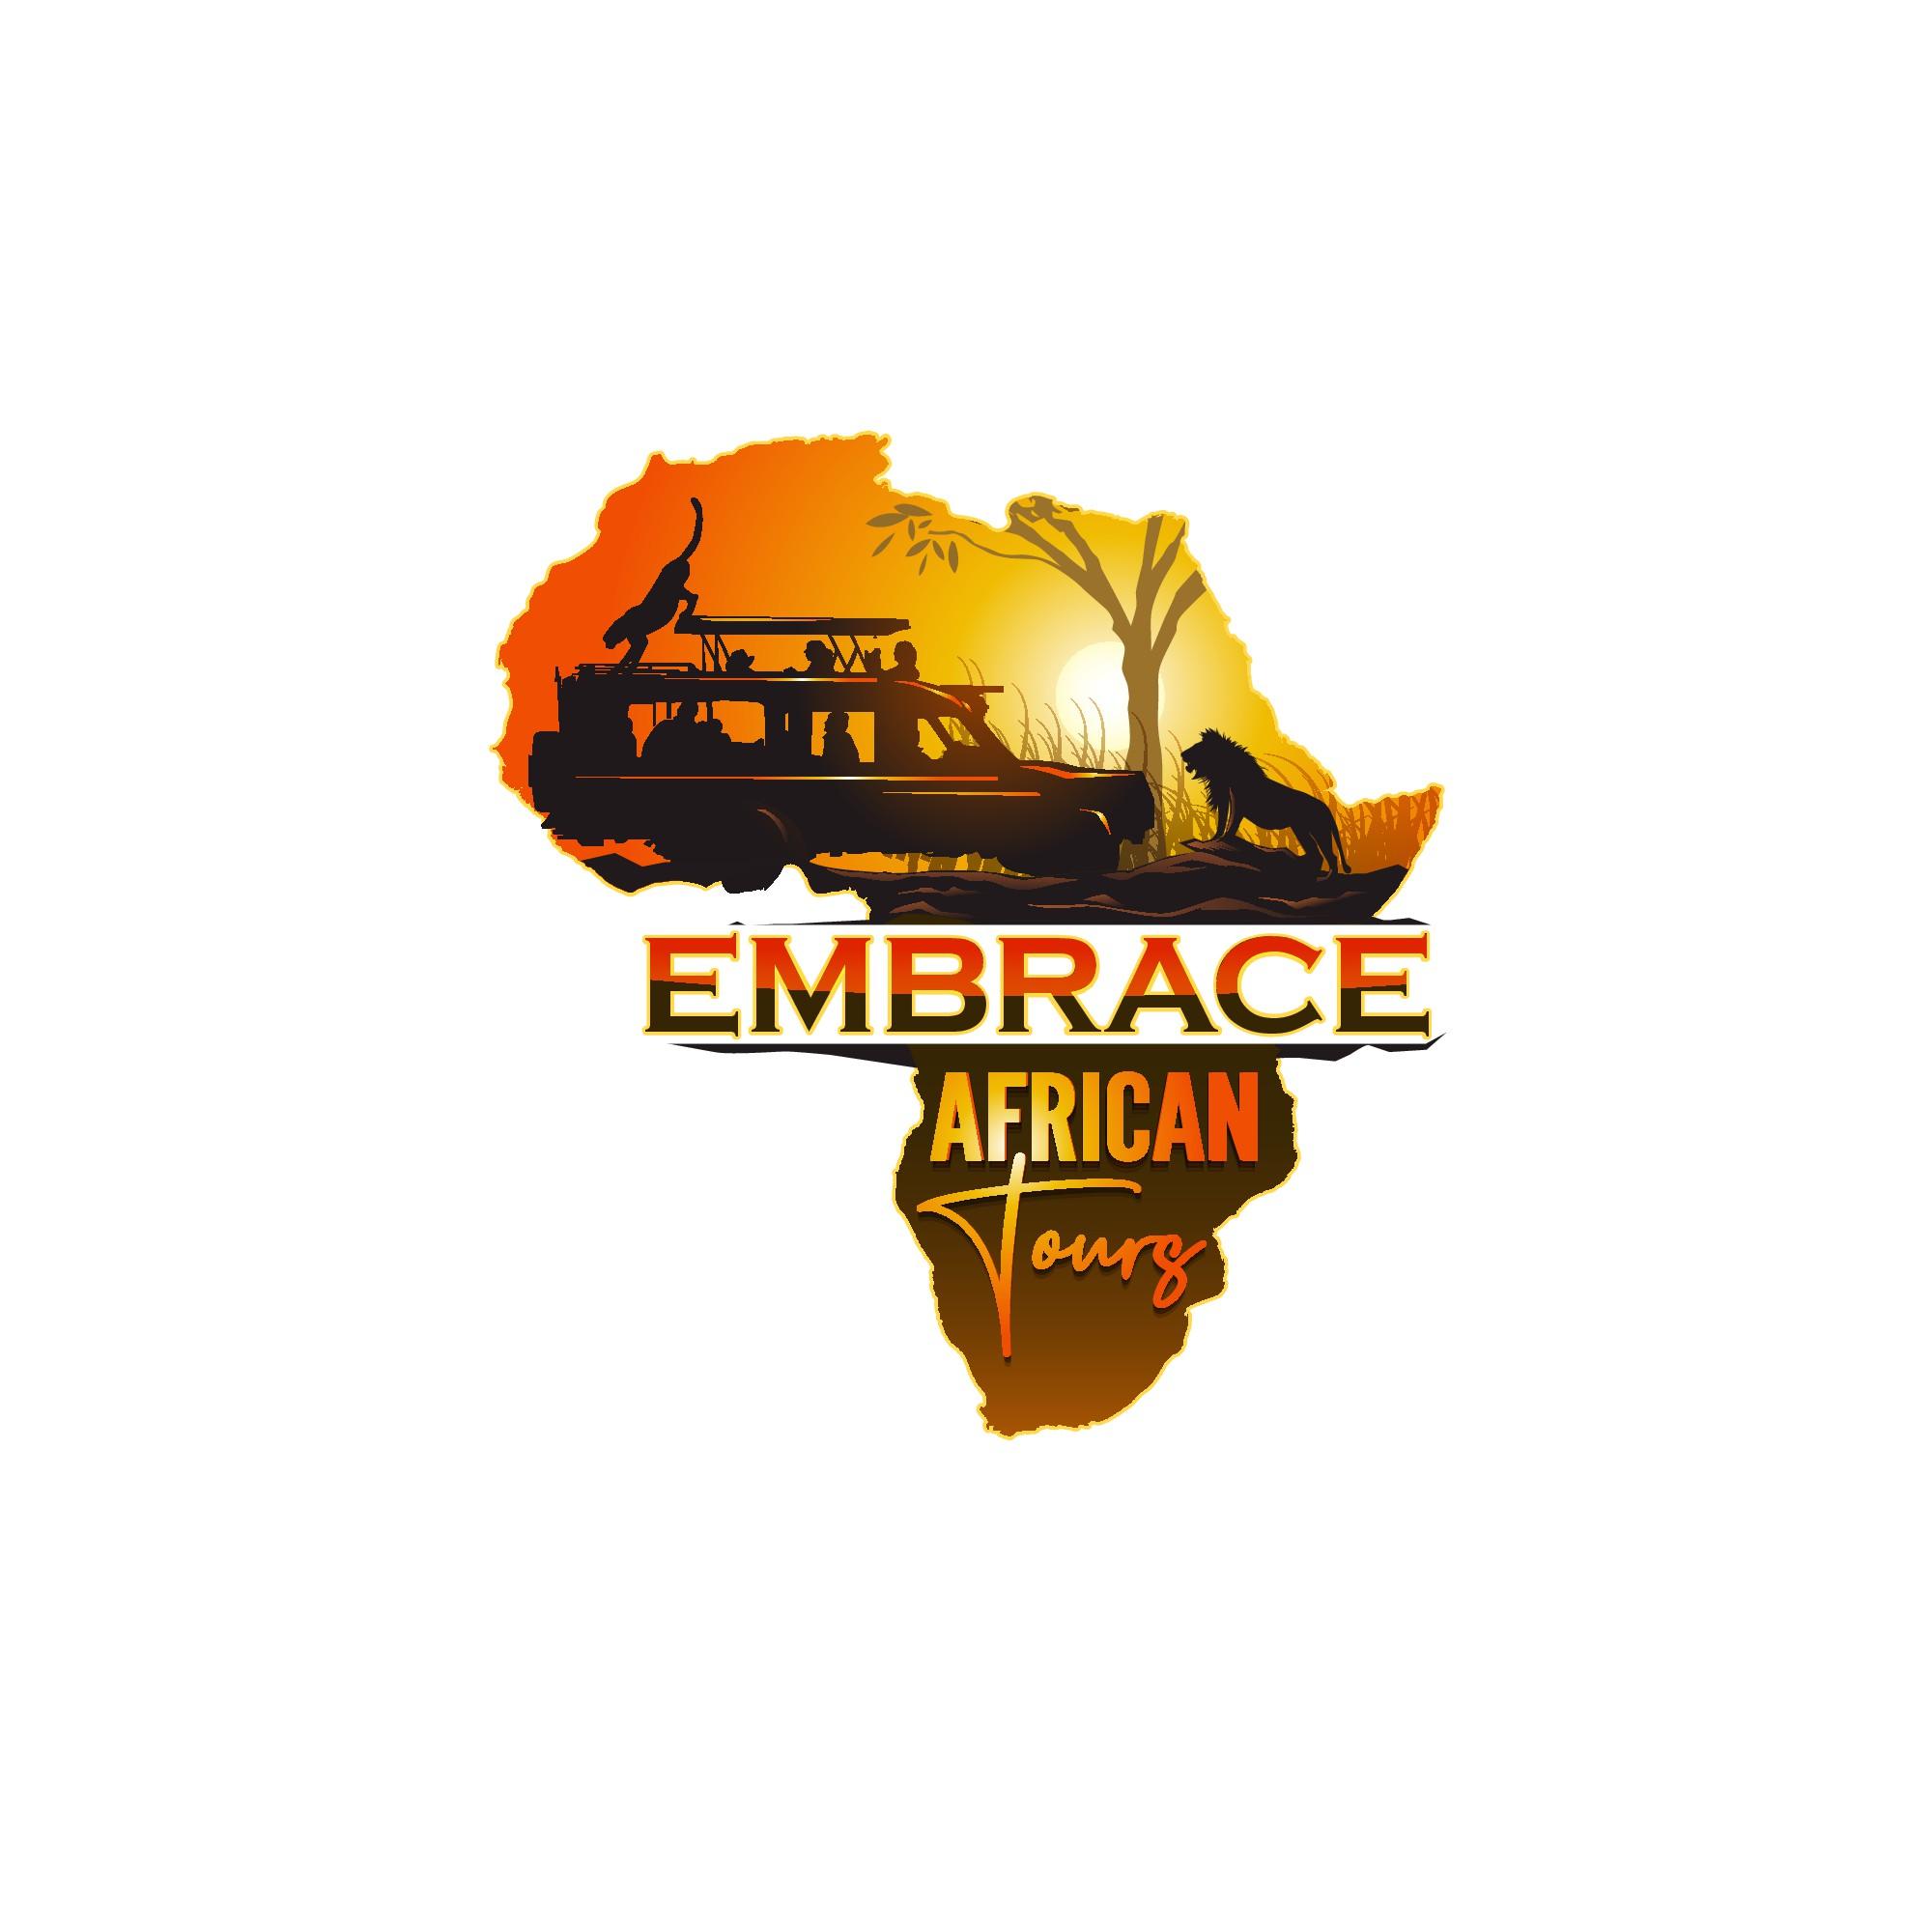 Design a cool logo for a brand new, socially conscious African tour company.